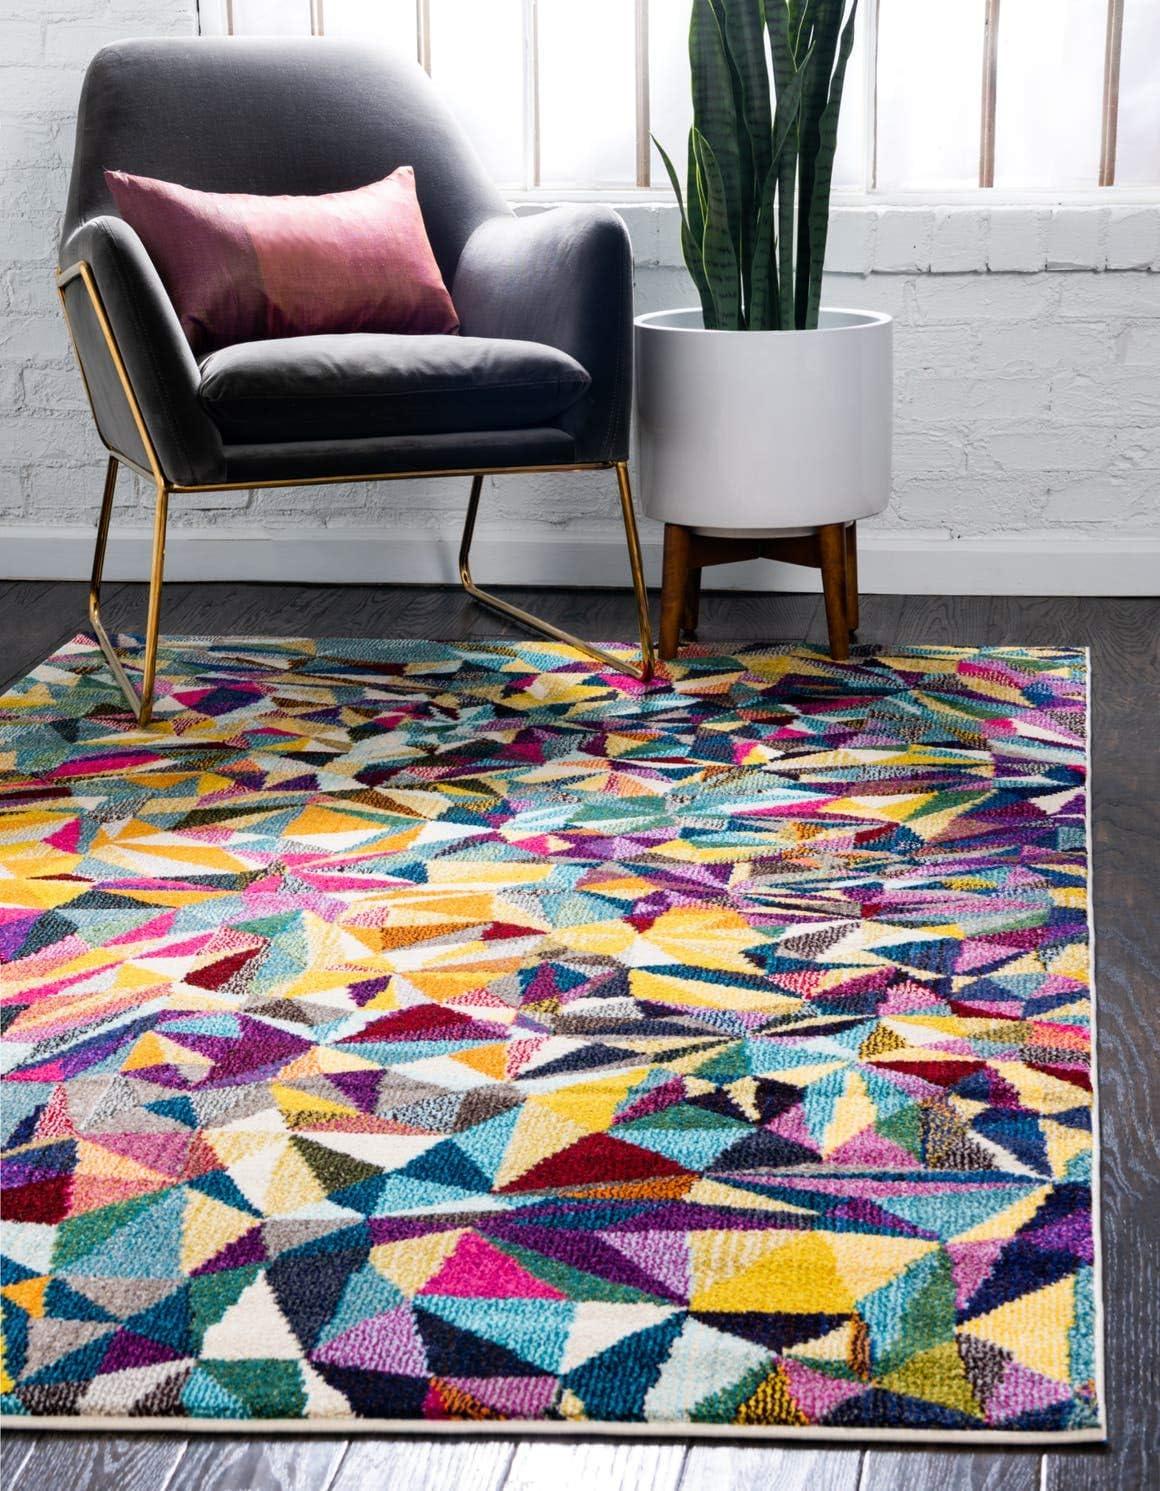 Unique Loom Estrella Collection Colorful Abstract Multi Area Rug 9 0 x 12 0